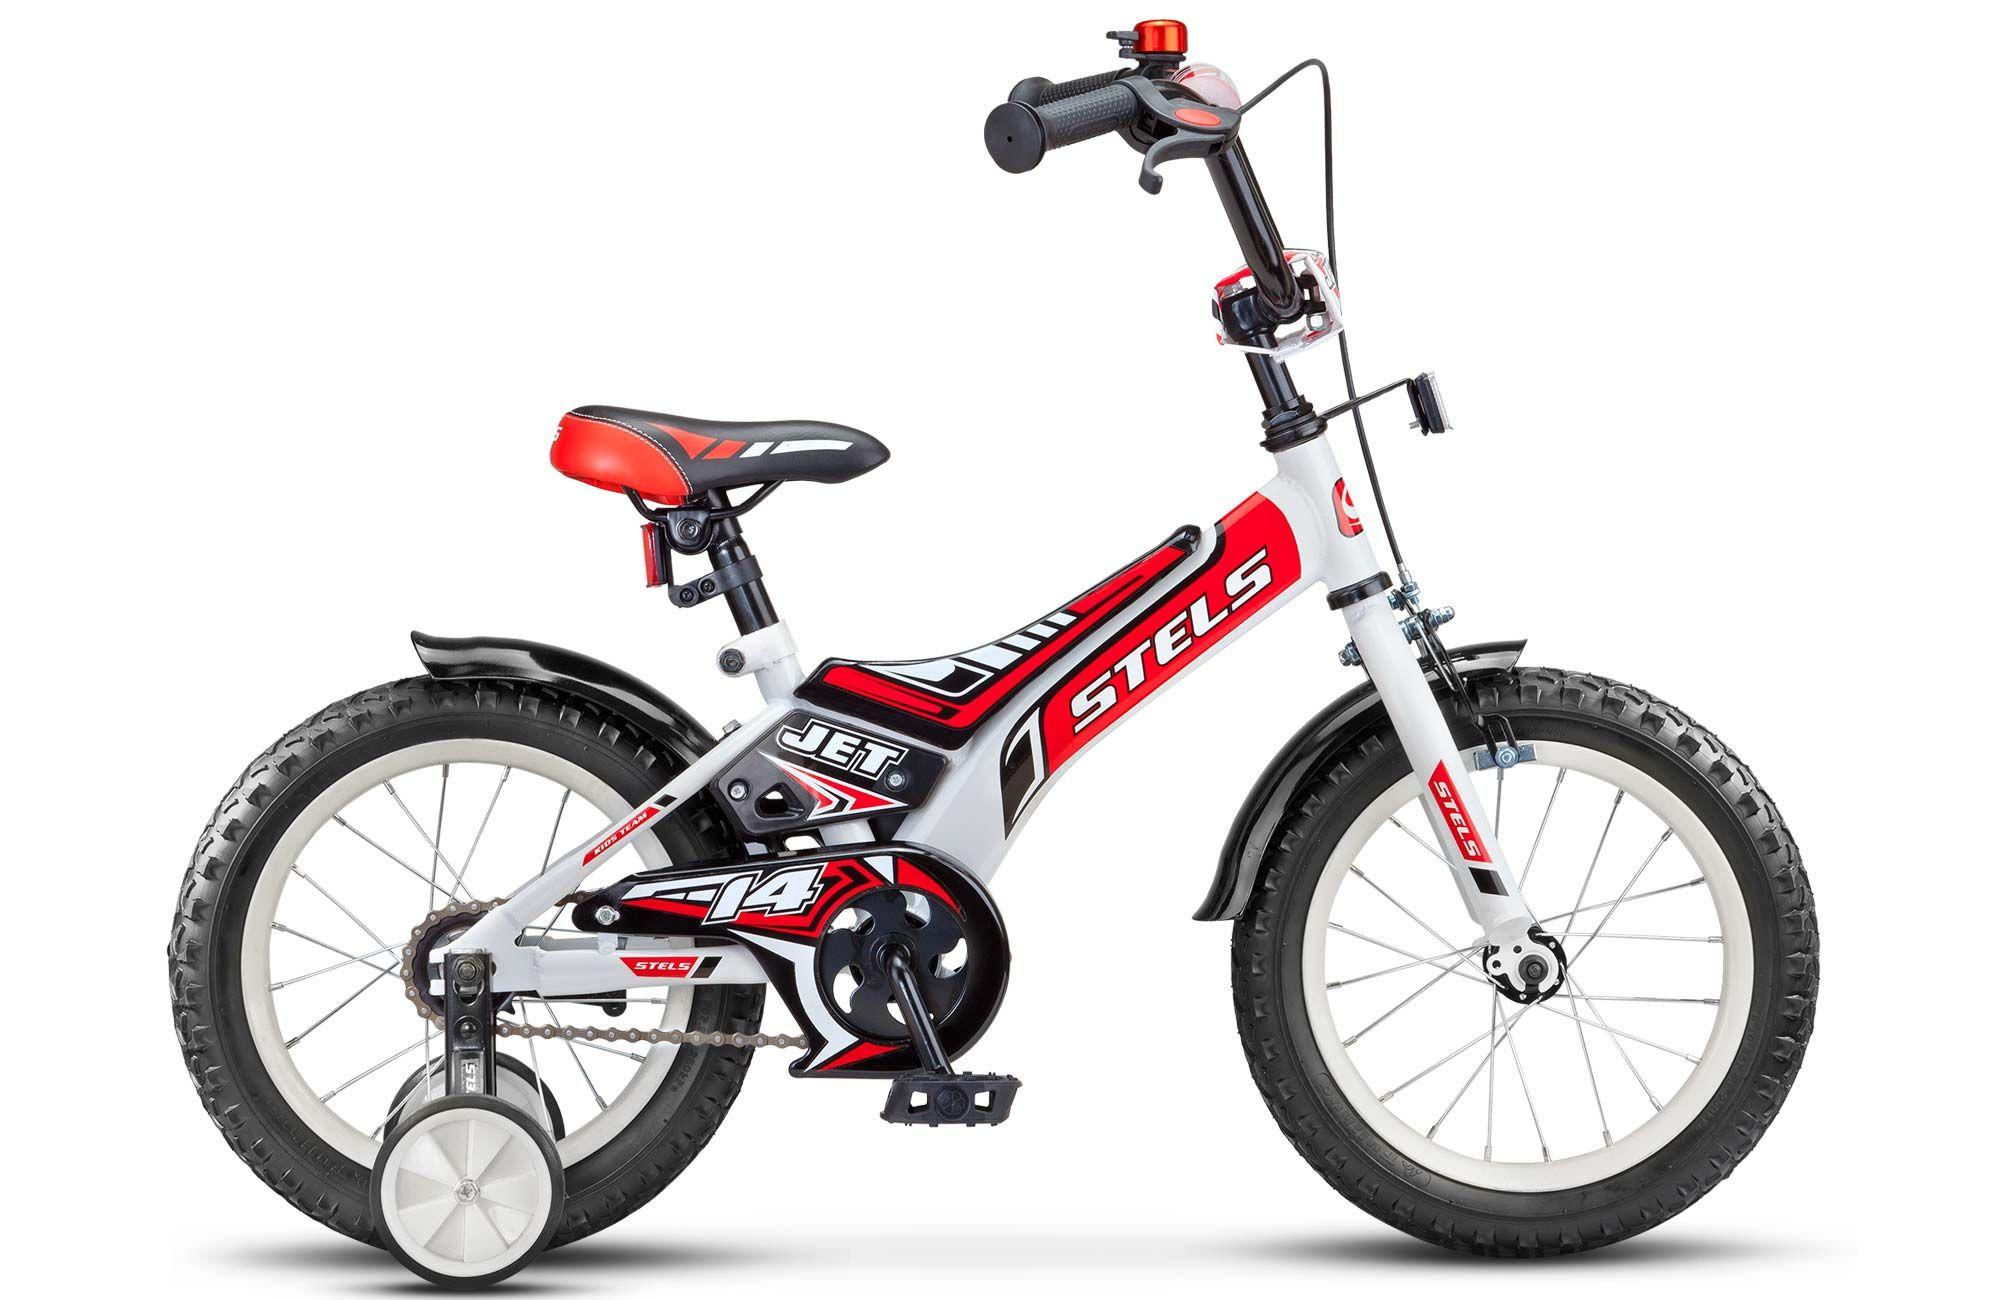 Велосипед Stels Jet 12 2015 велосипед бэимикс в москве